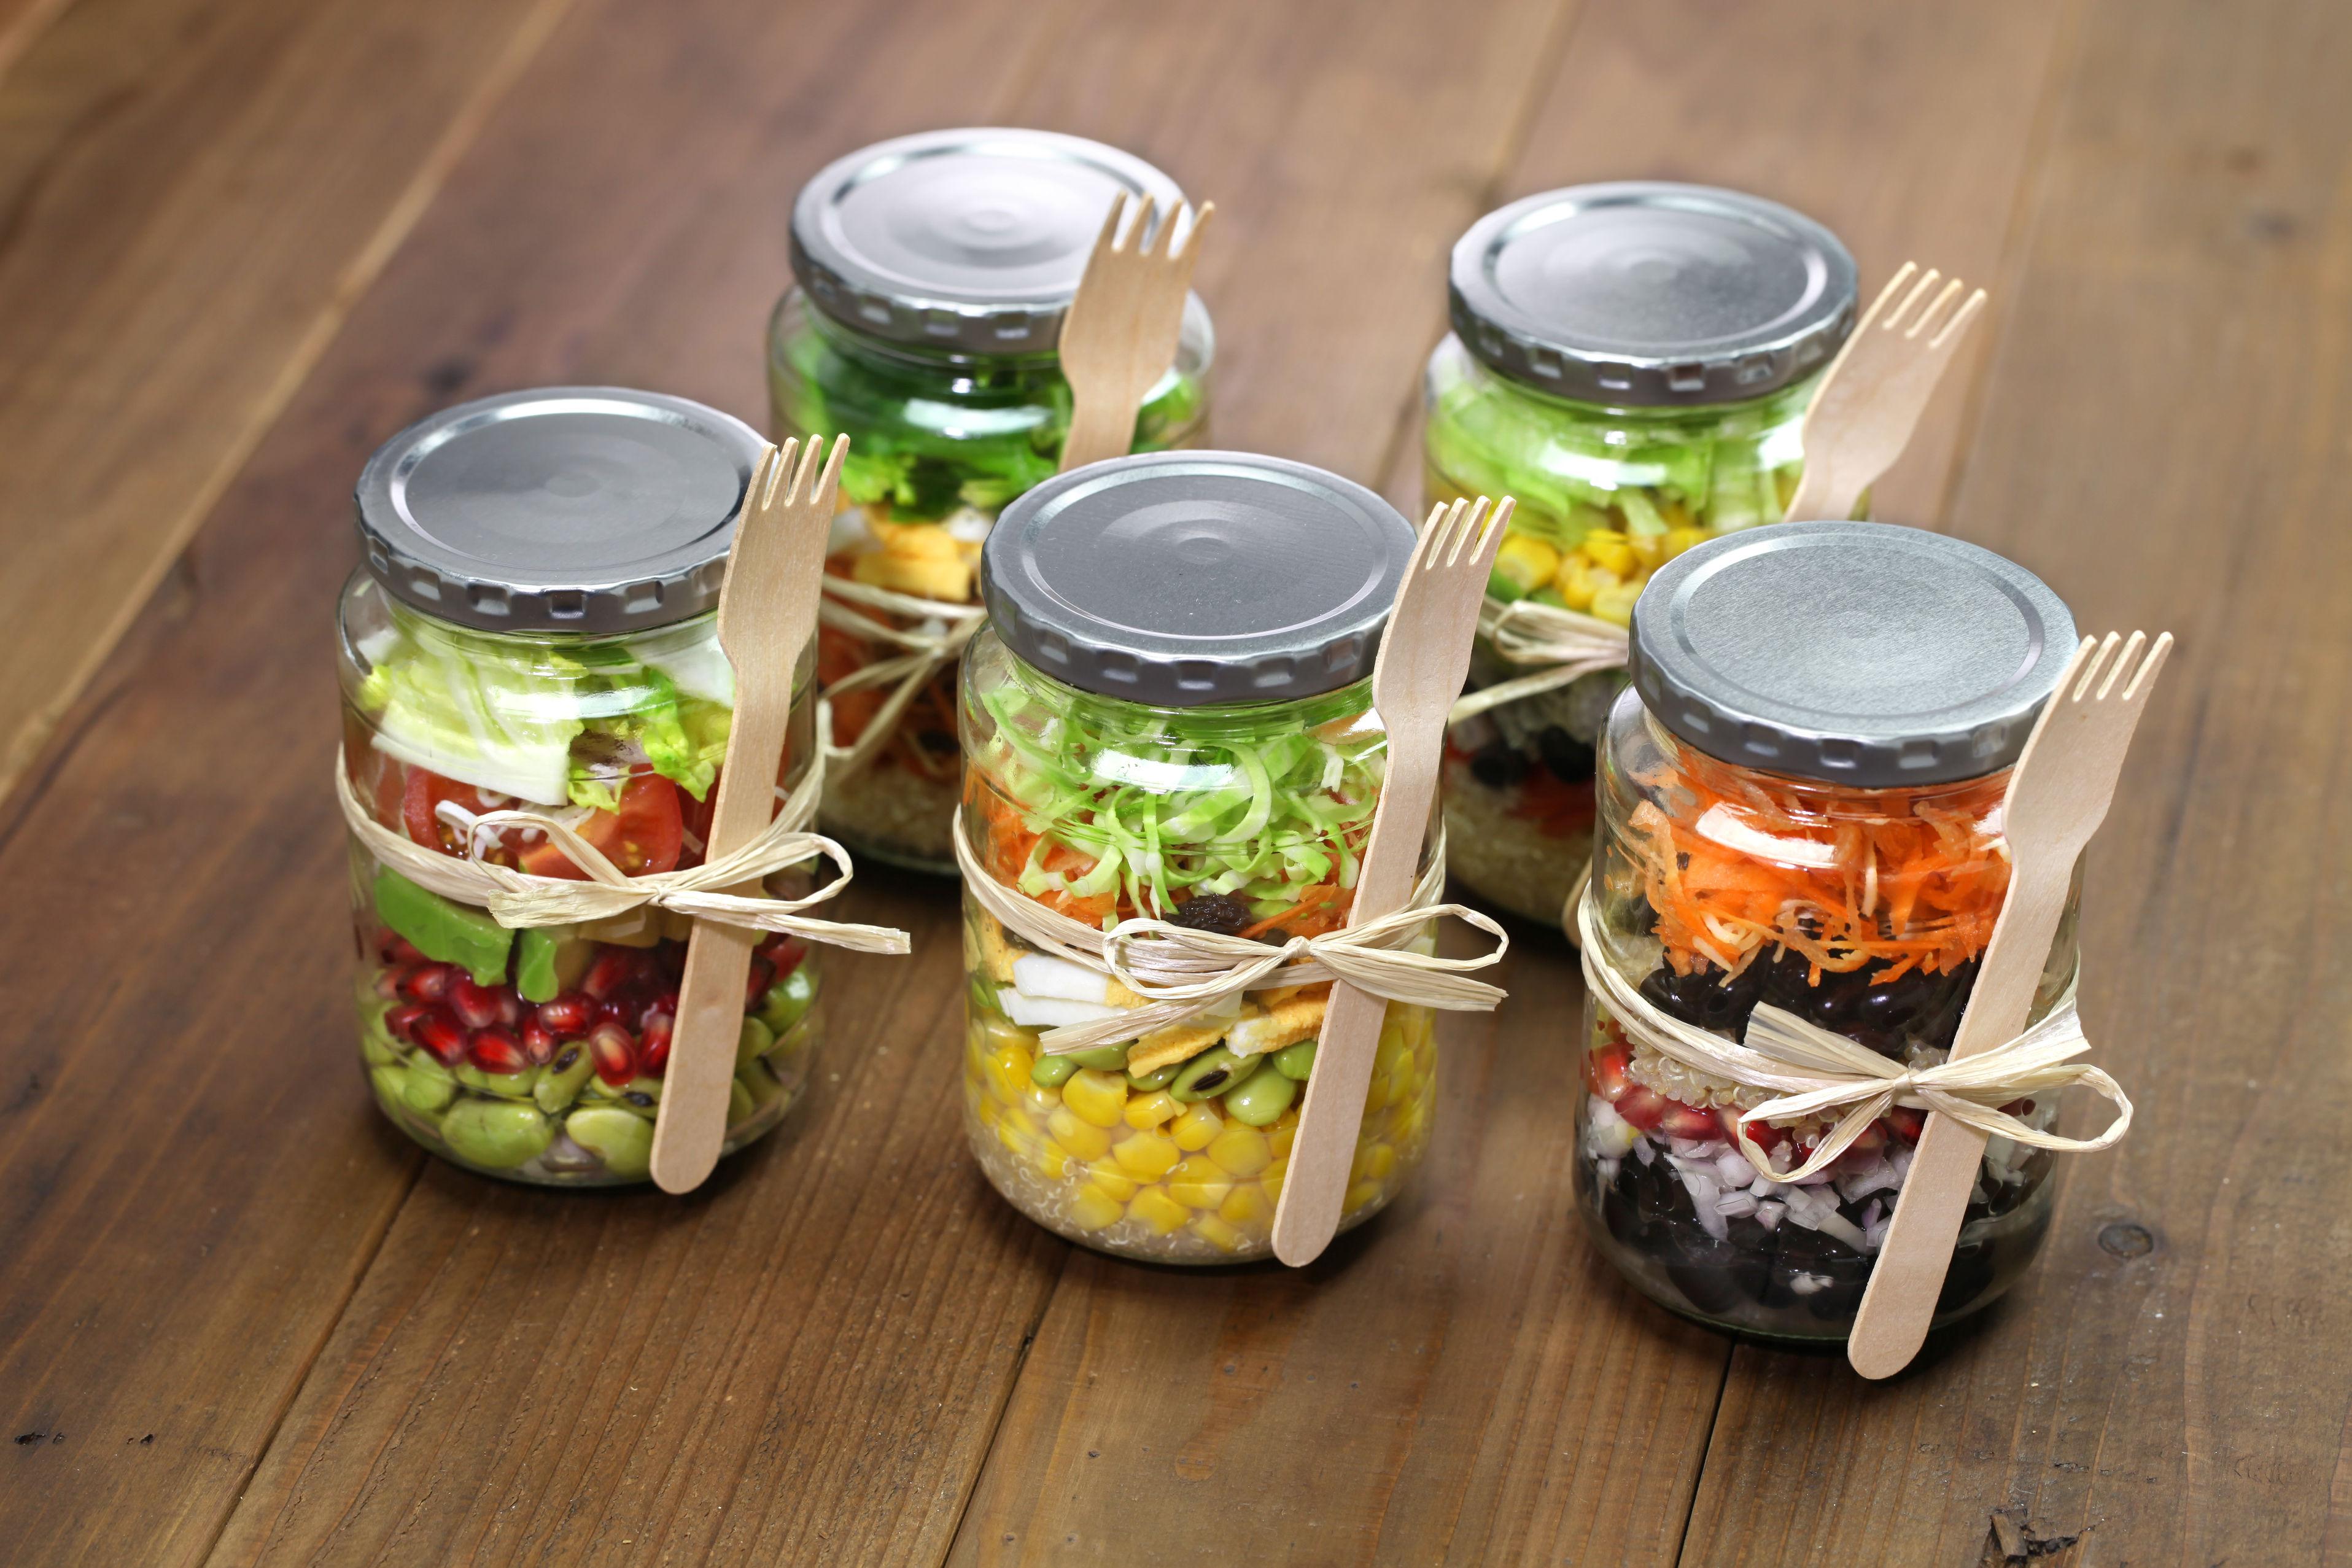 salade en bocal  pour déjeuner